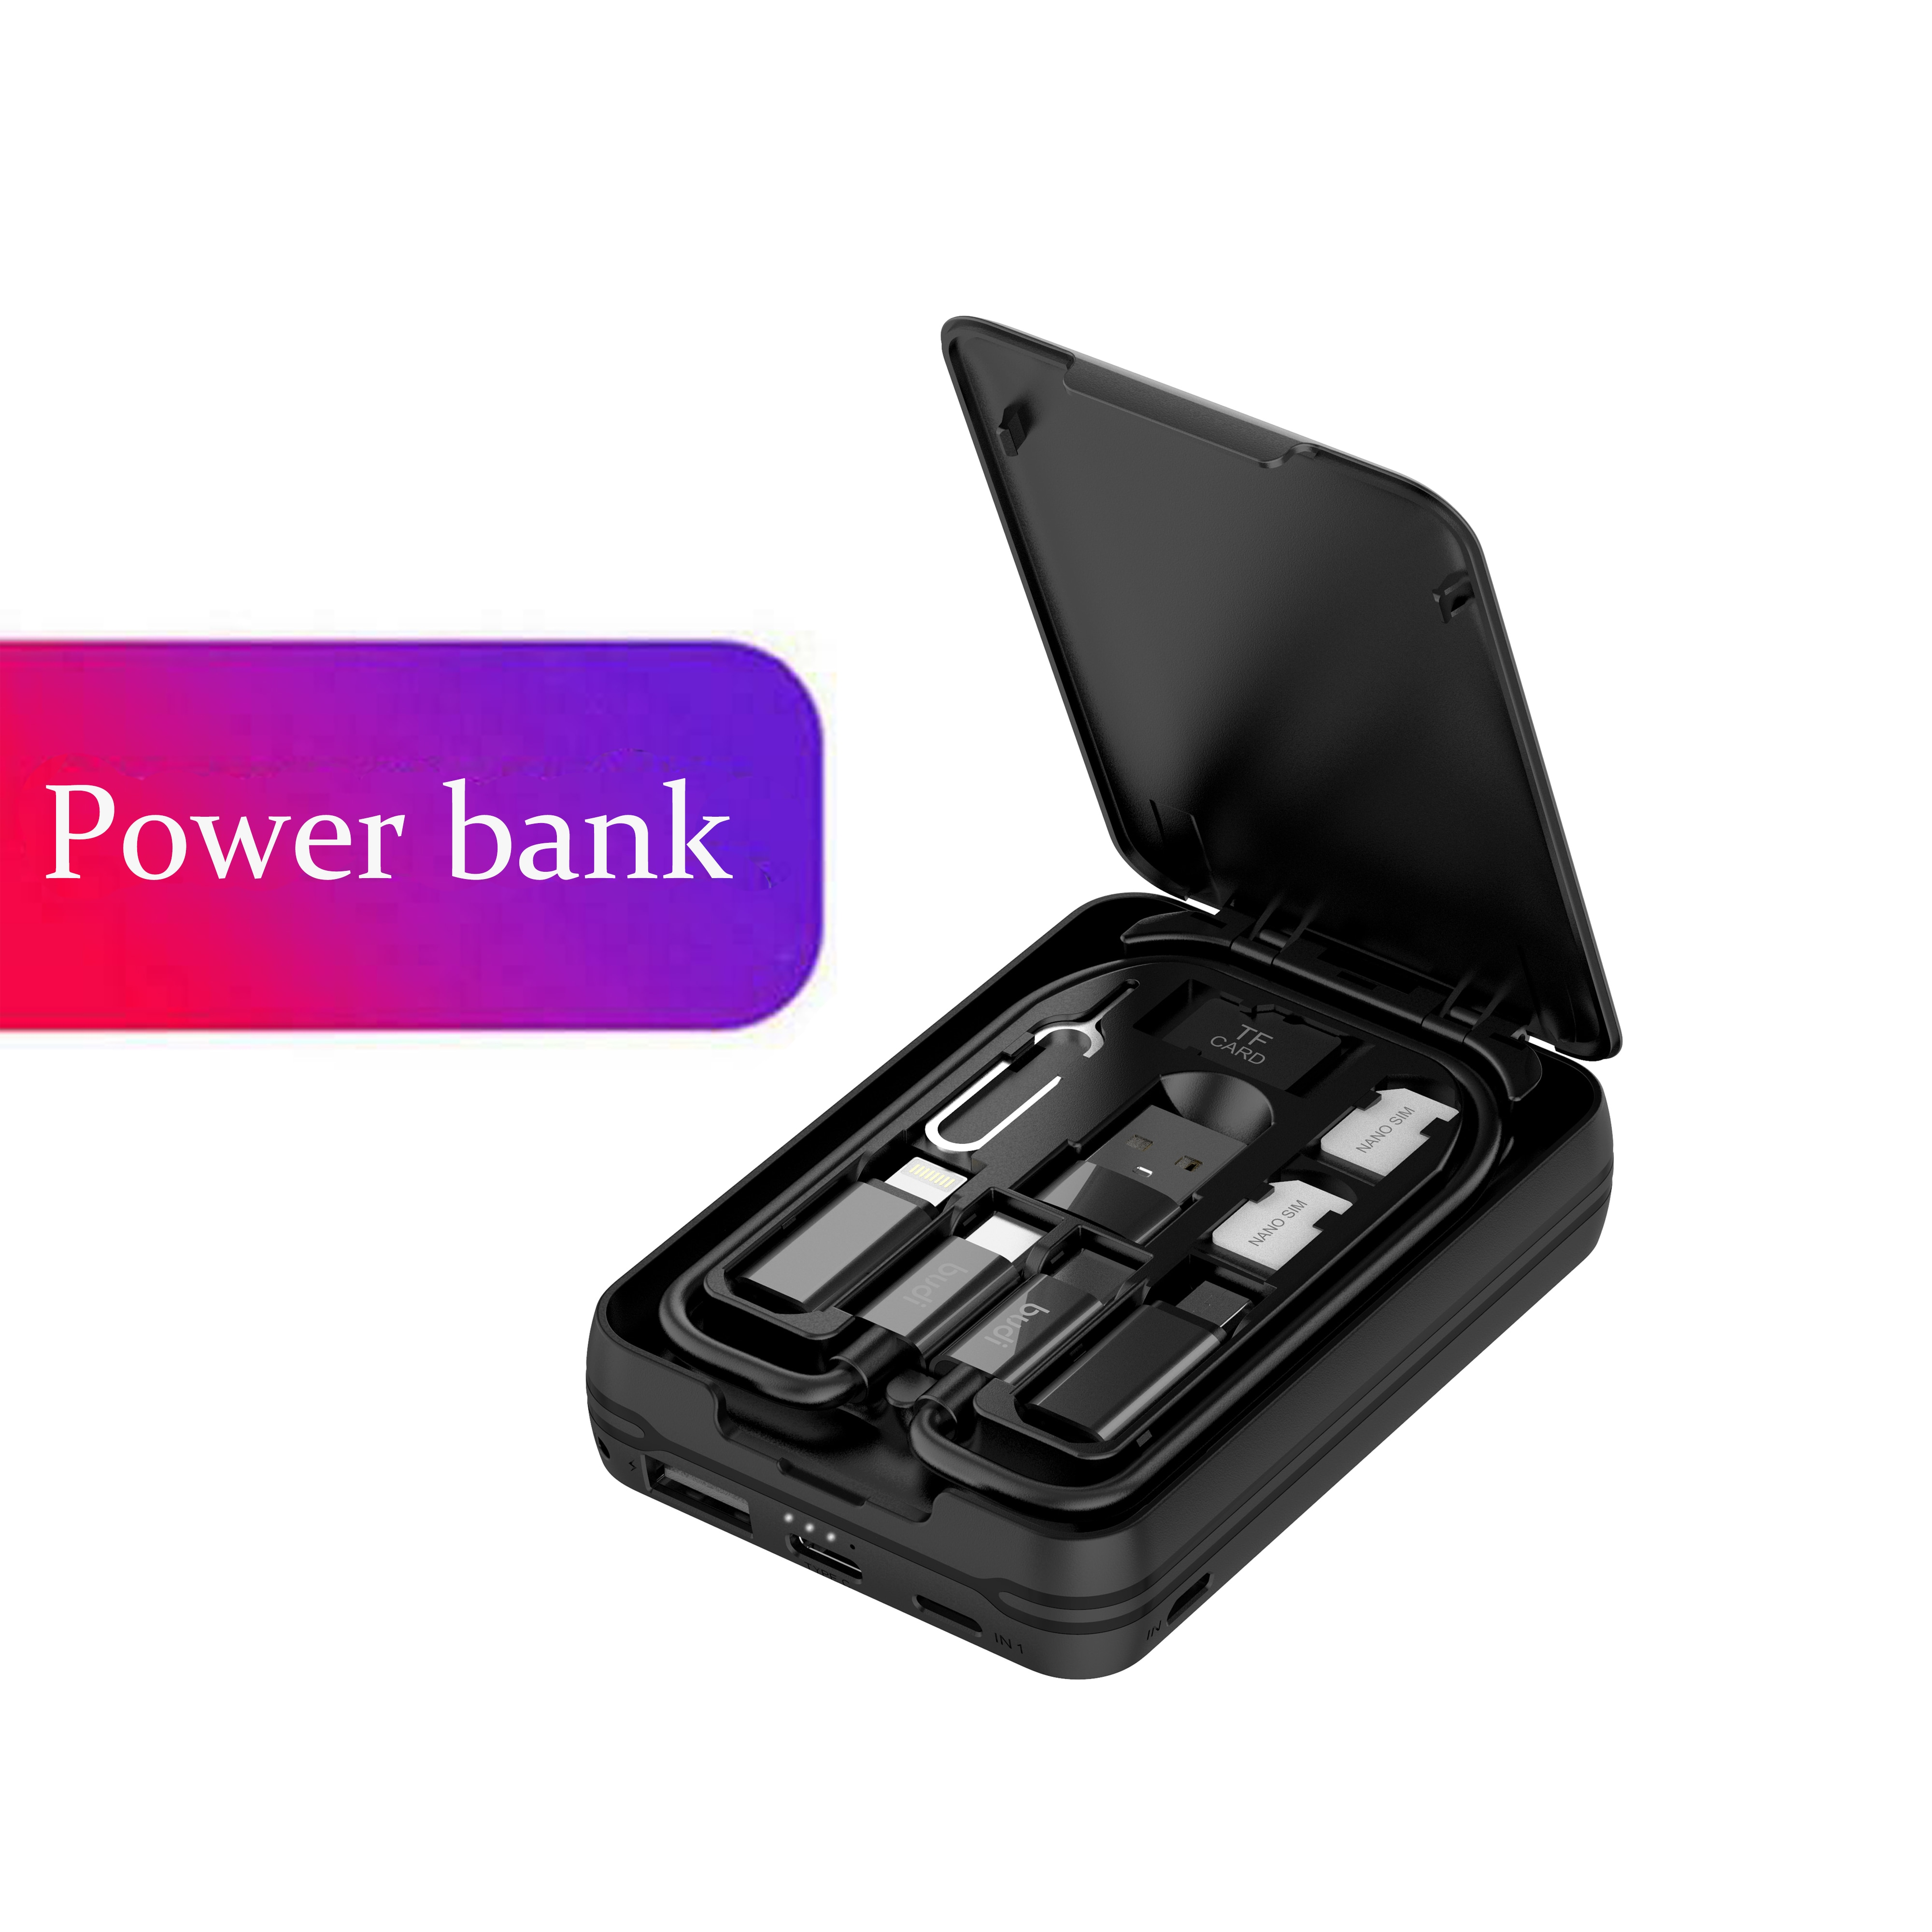 Universal Multi-funktion Smart Adapter Karte Lagerung Box Daten Kabel USB Wireless Charging Power Bank Für Iphone Xiaomi Huawei